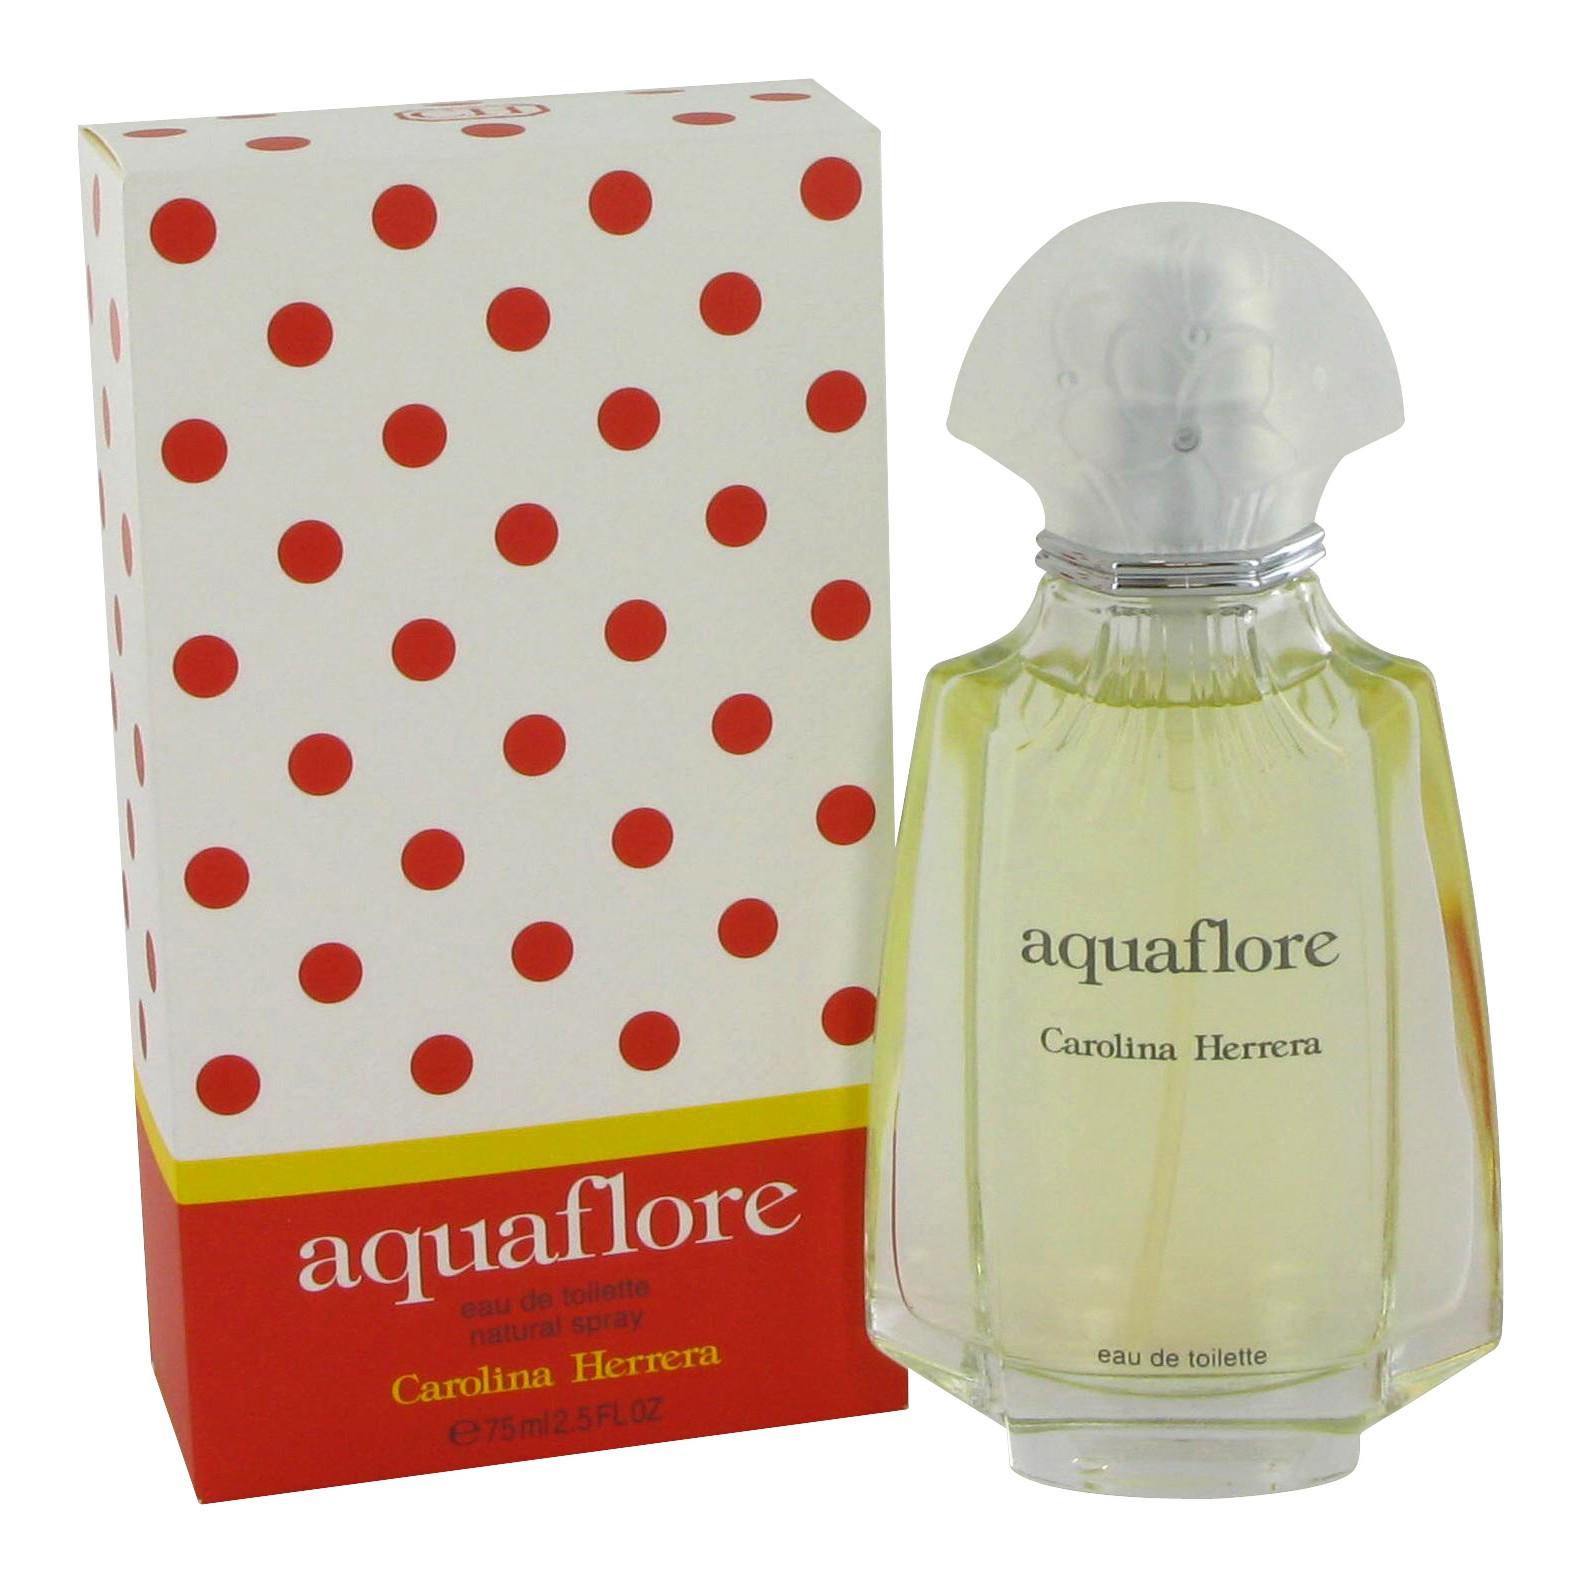 Carolina Herrera Aquaflore аромат для женщин